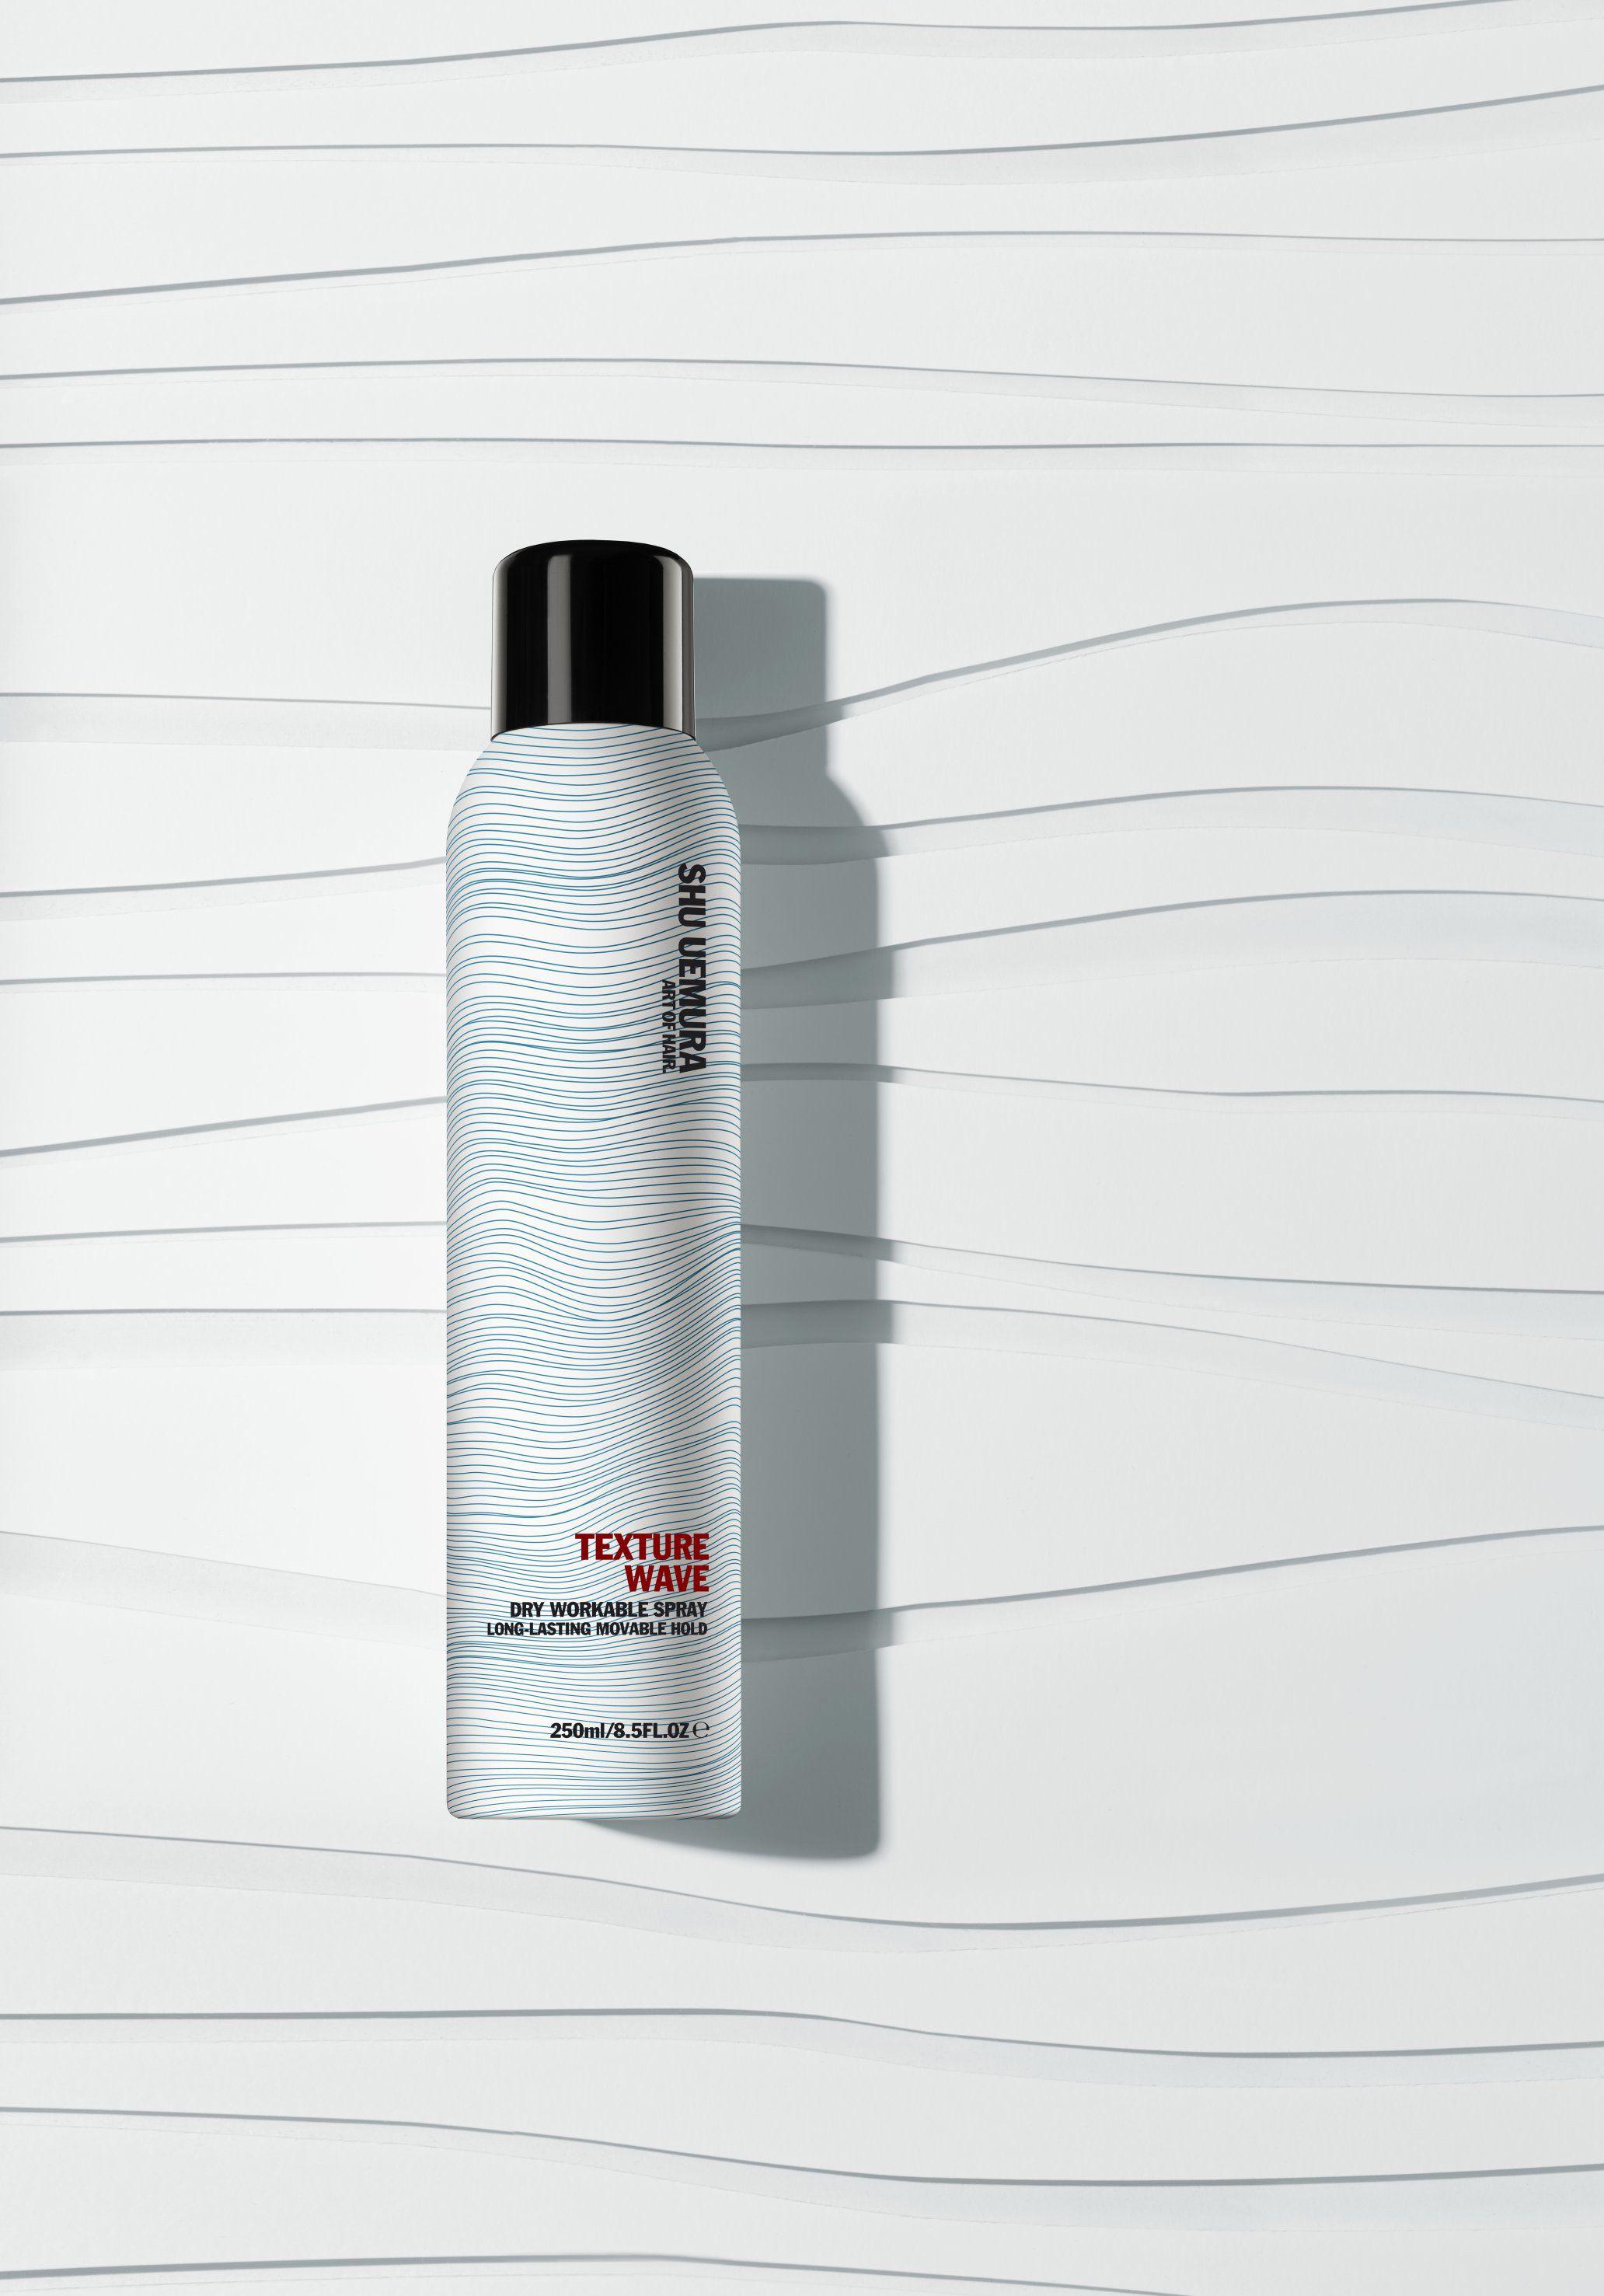 Shu Uemura Texture Wave Dry Workable Spray Long Lasting